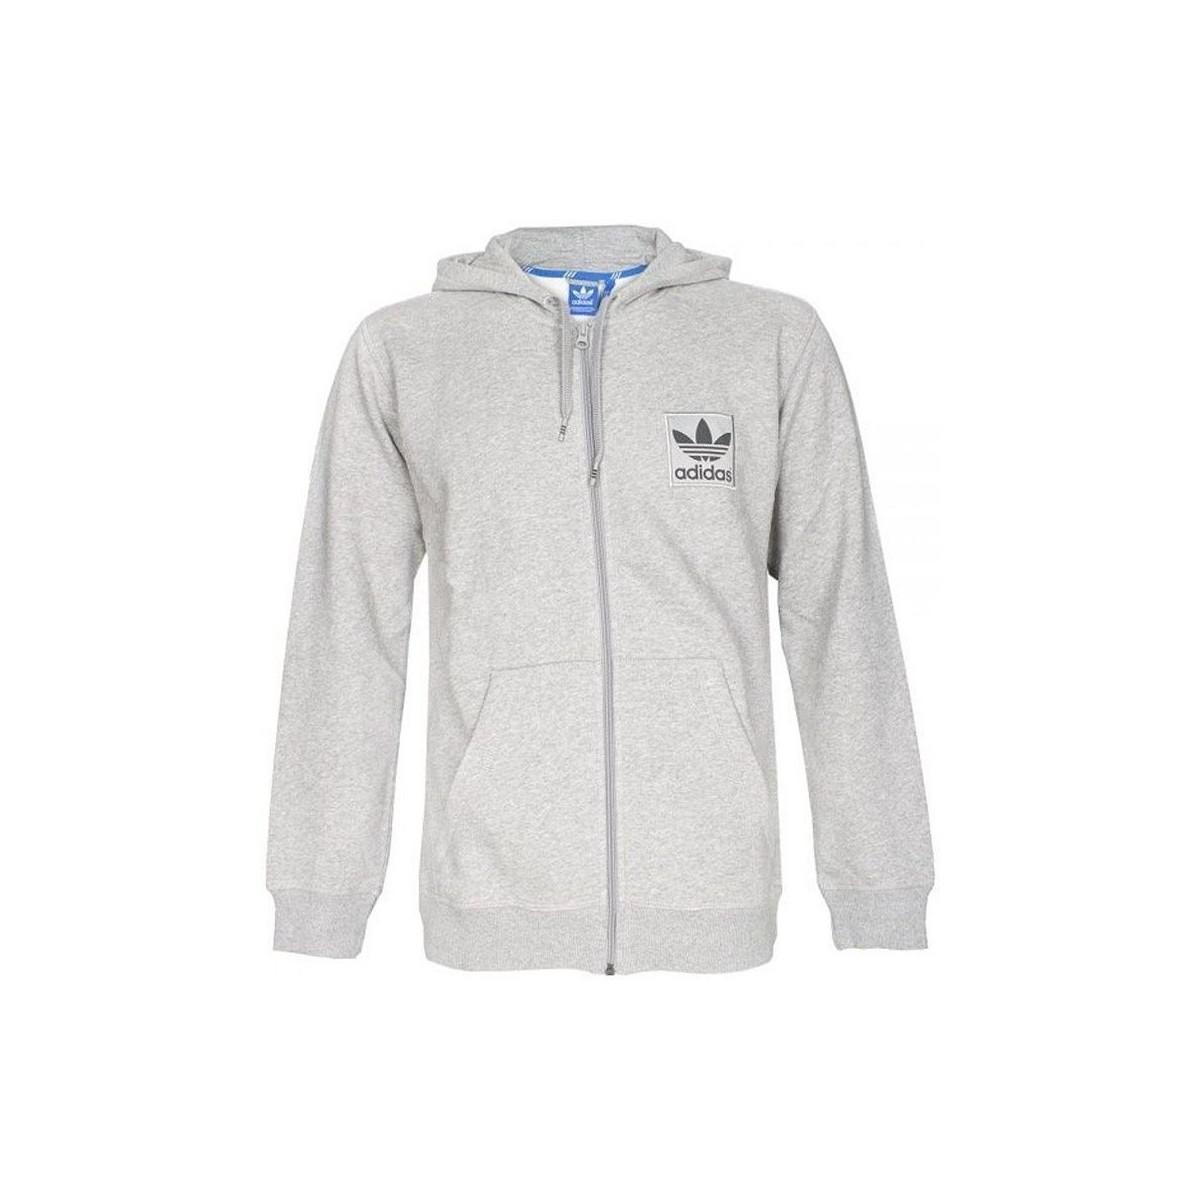 009f425561 Adidas Spess Fz Hoody Men's Sweatshirt In Grey in Gray for Men - Lyst